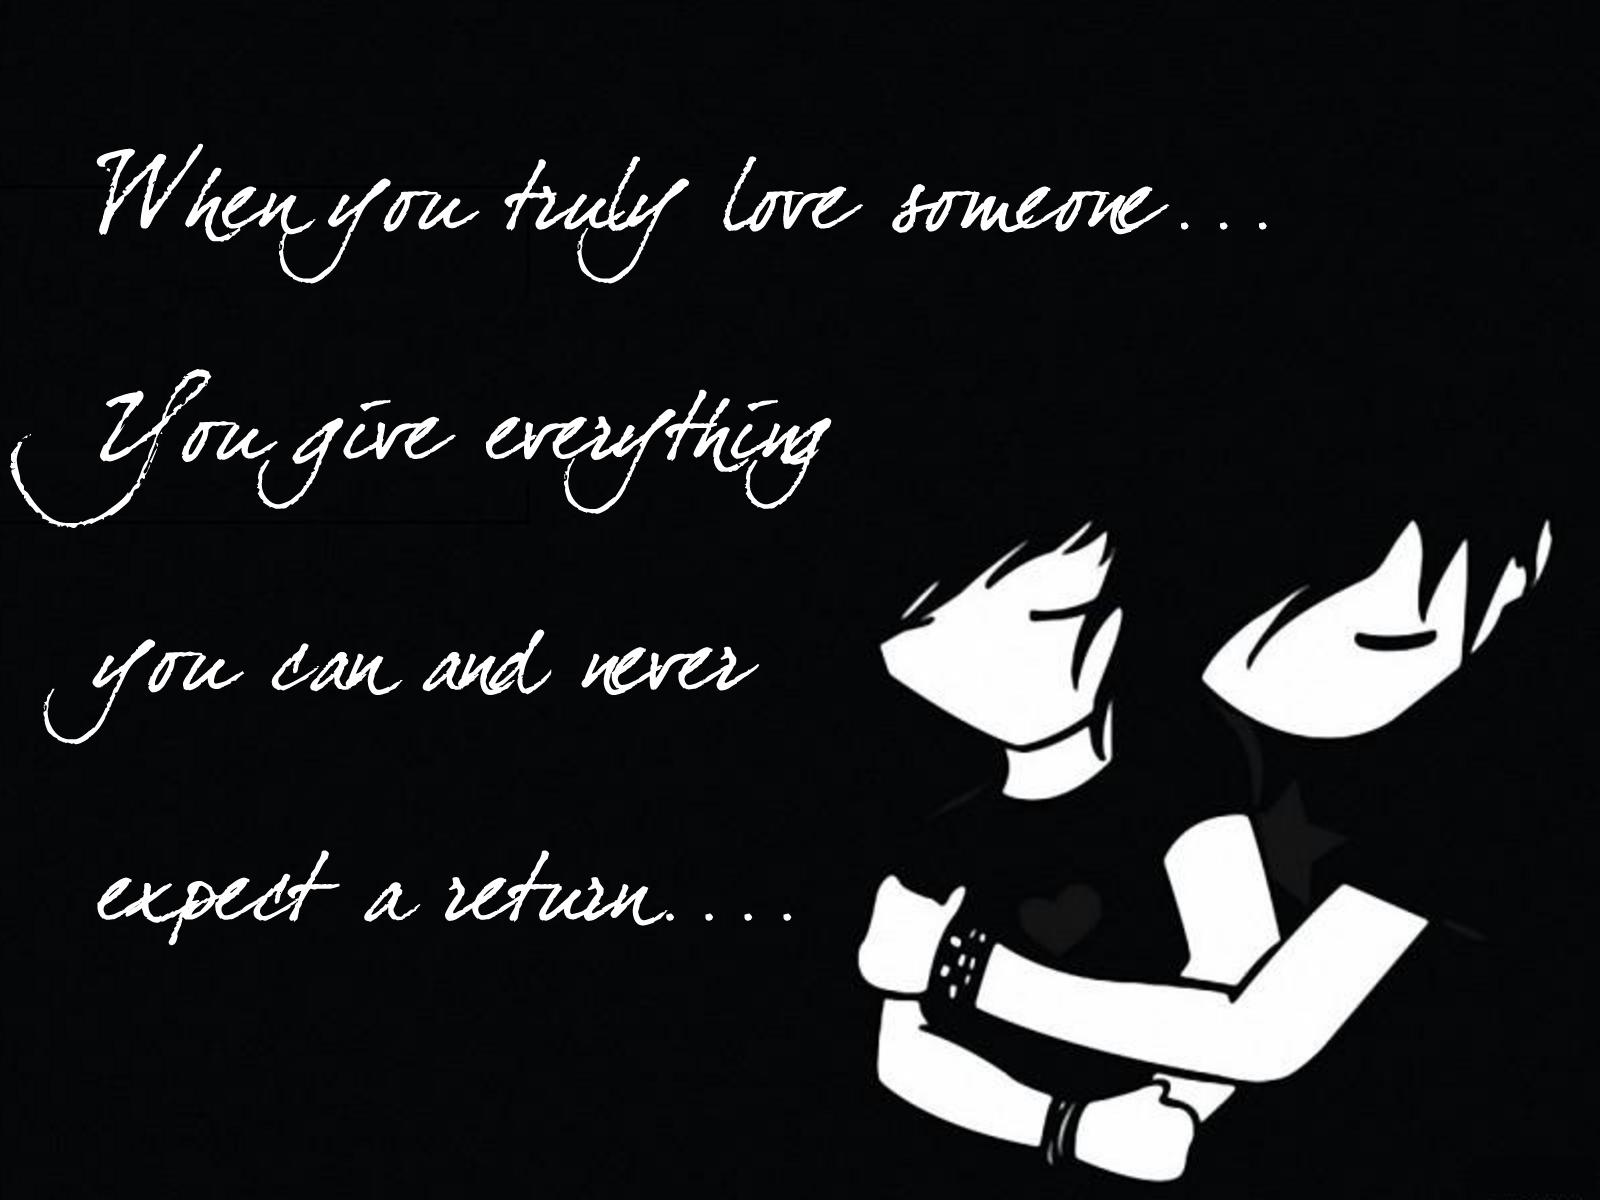 Love quote #2